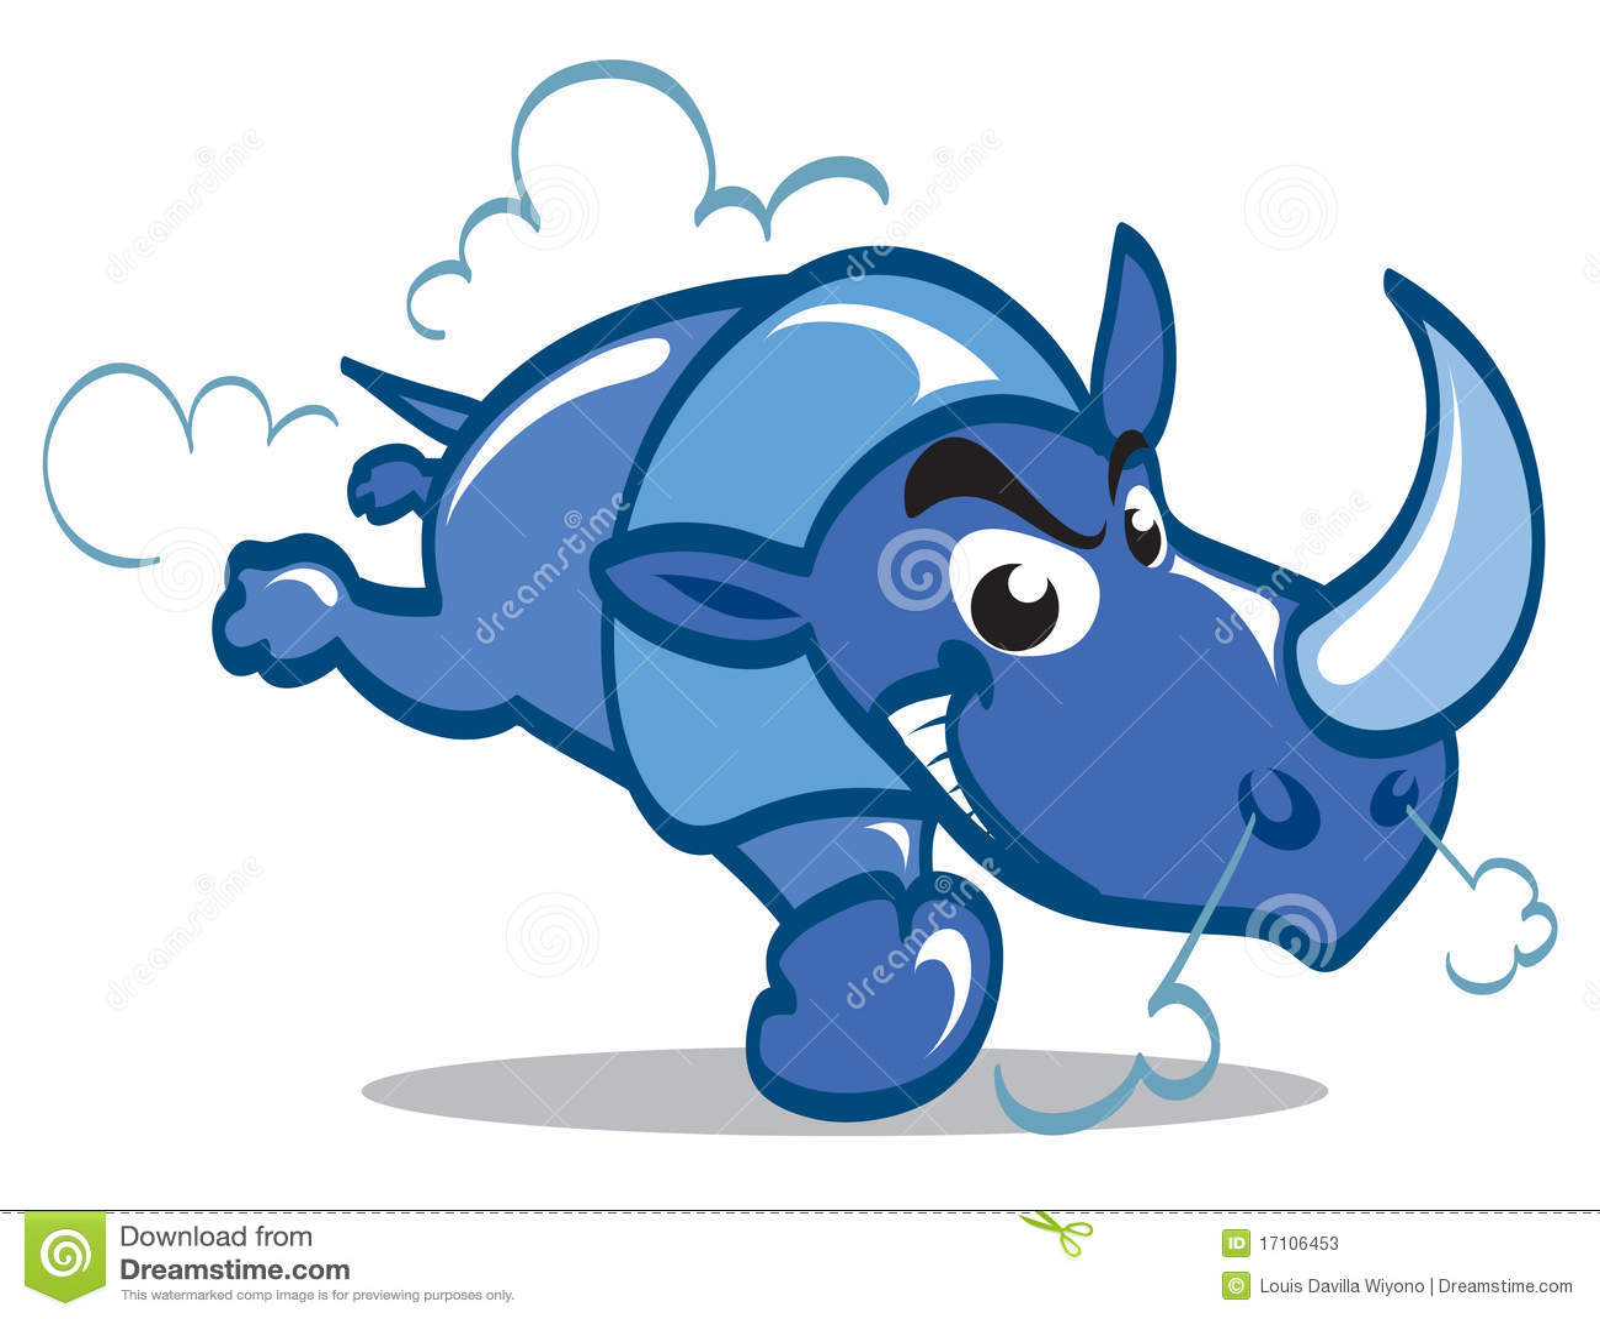 Rhinocéros bleu illustration de vecteur. Illustration du cartoon ...